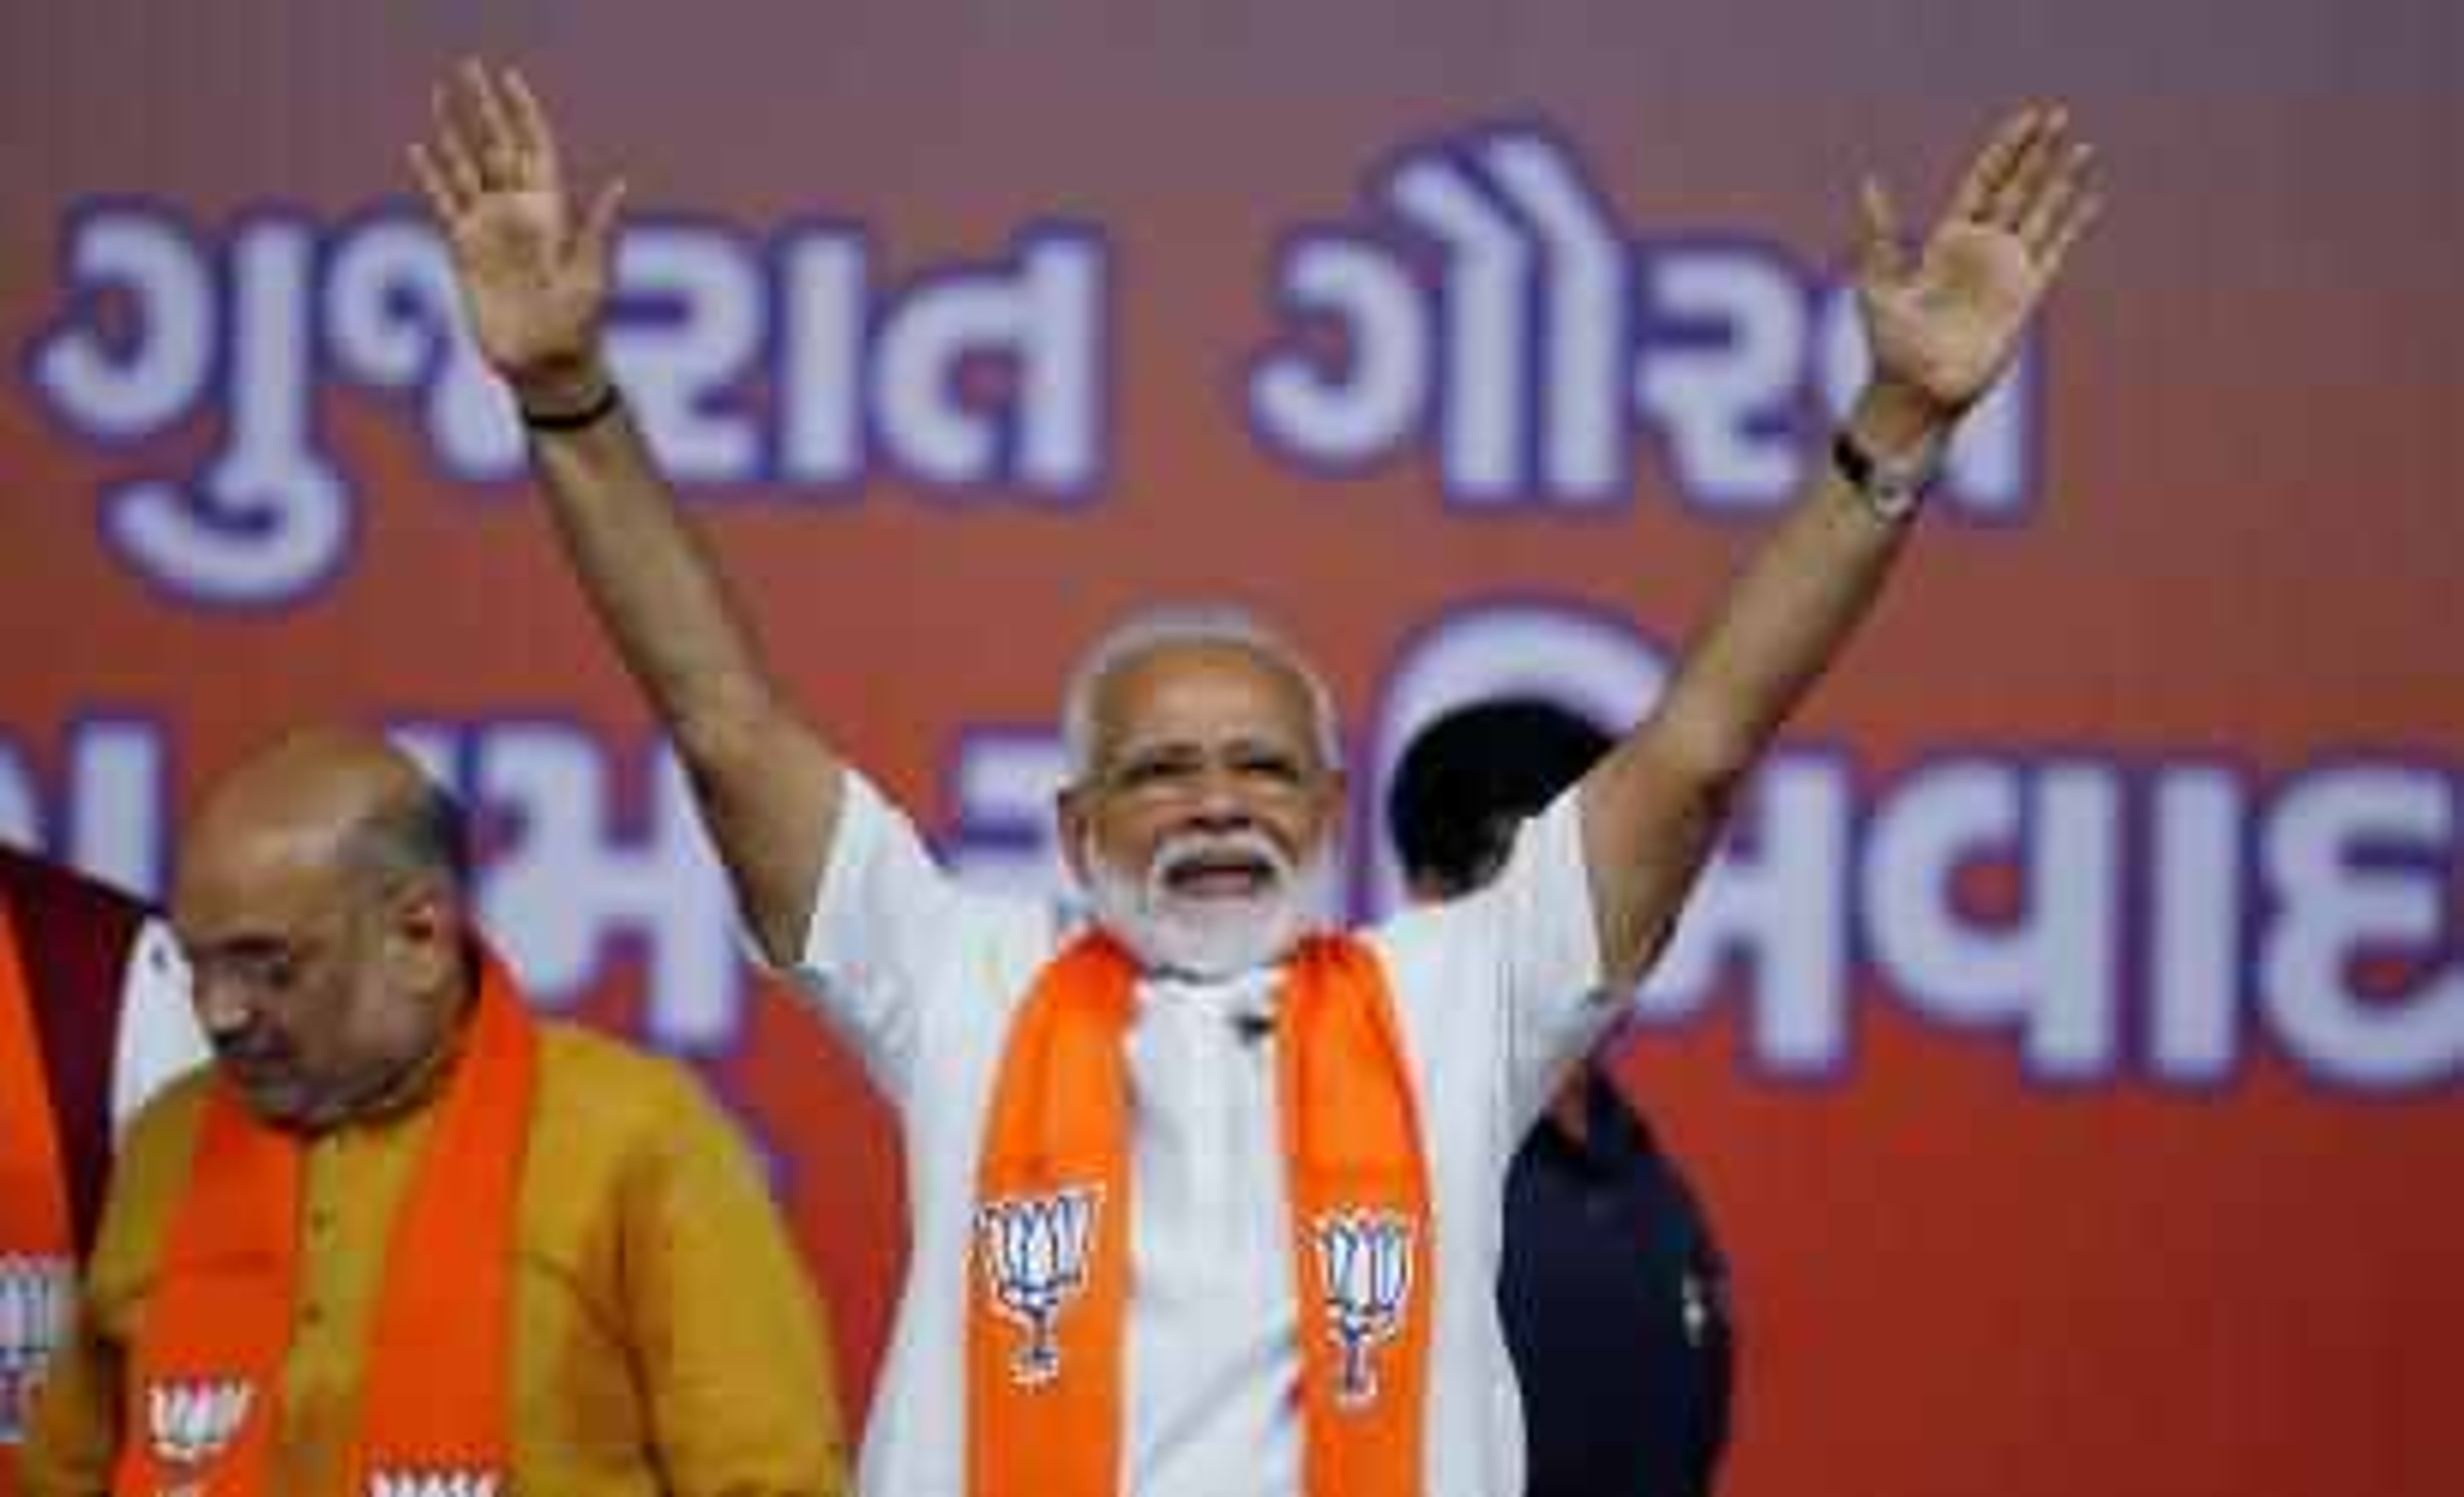 Modi more admired than Pope Francis, Dalai Lama, Ronaldo